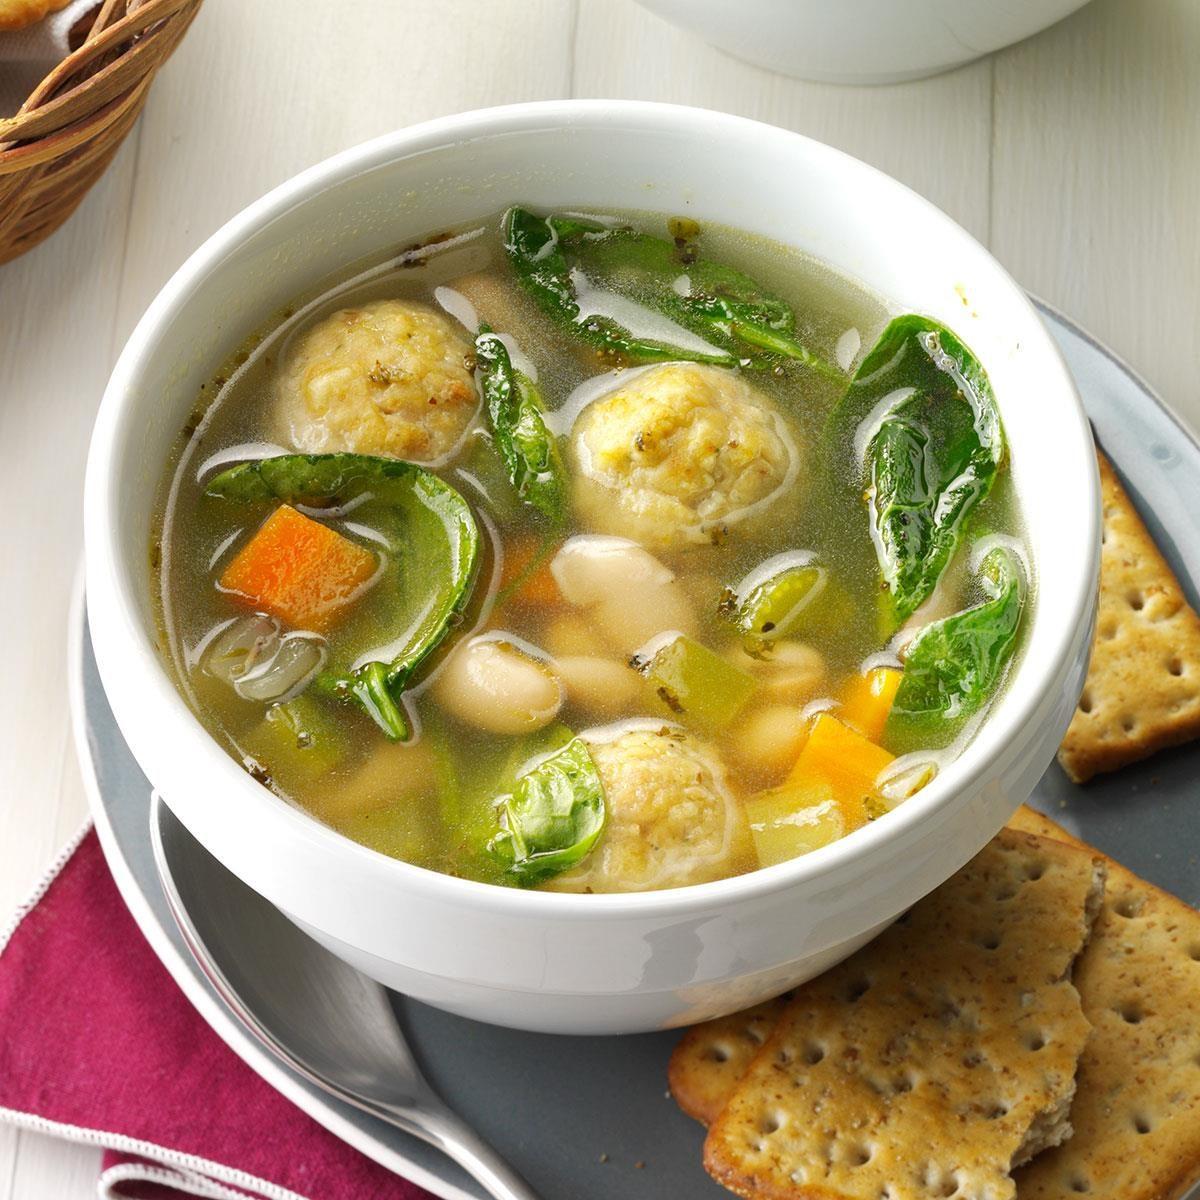 North Dakota: Italian Chicken Meatball and Bean Soup